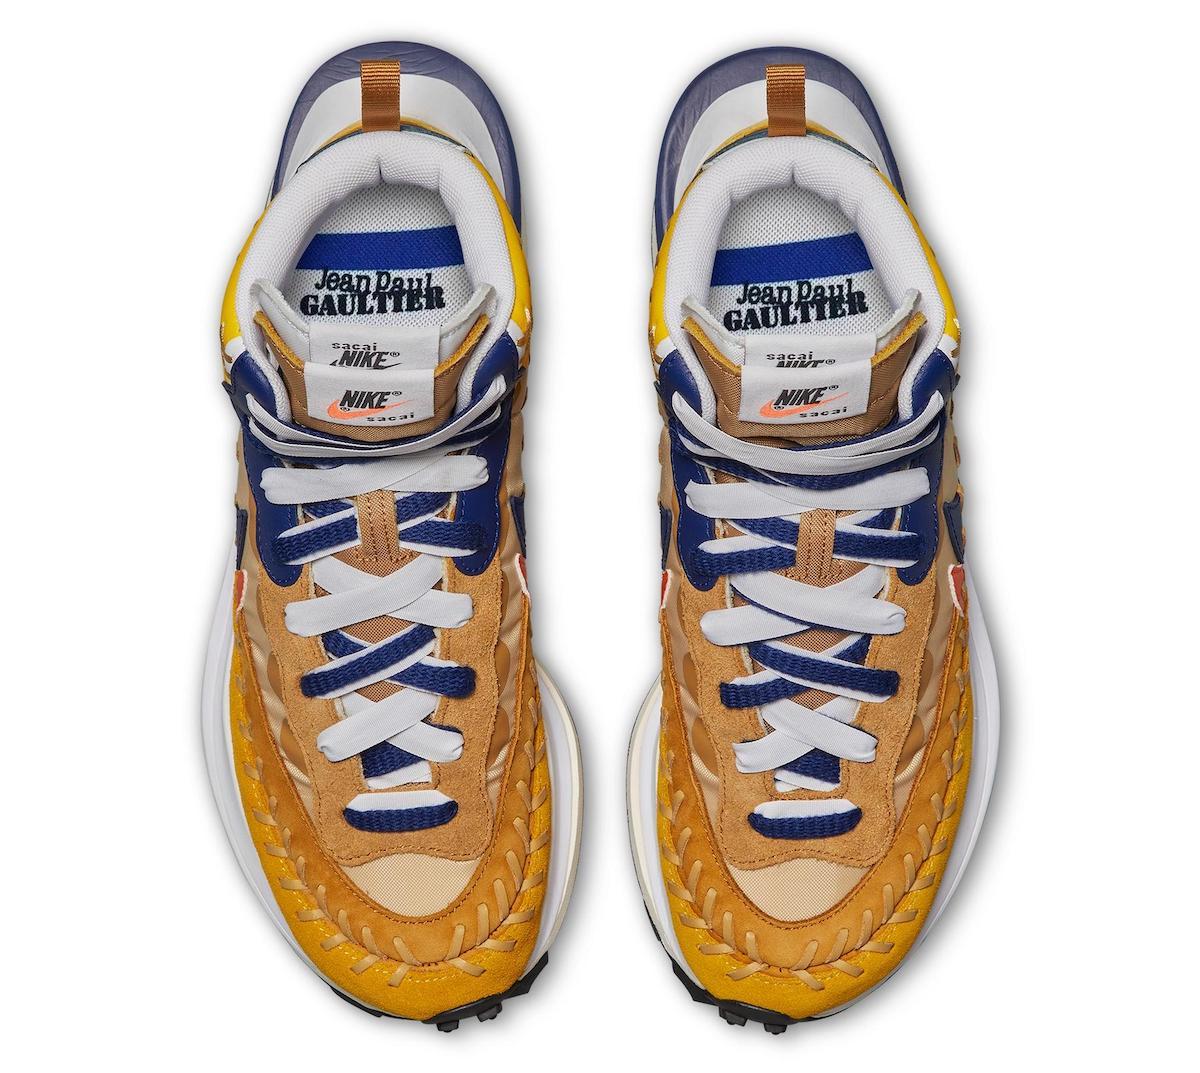 sacai jean paul gaultier nike vaporwaffle sesame DH9186 200 release info price 3